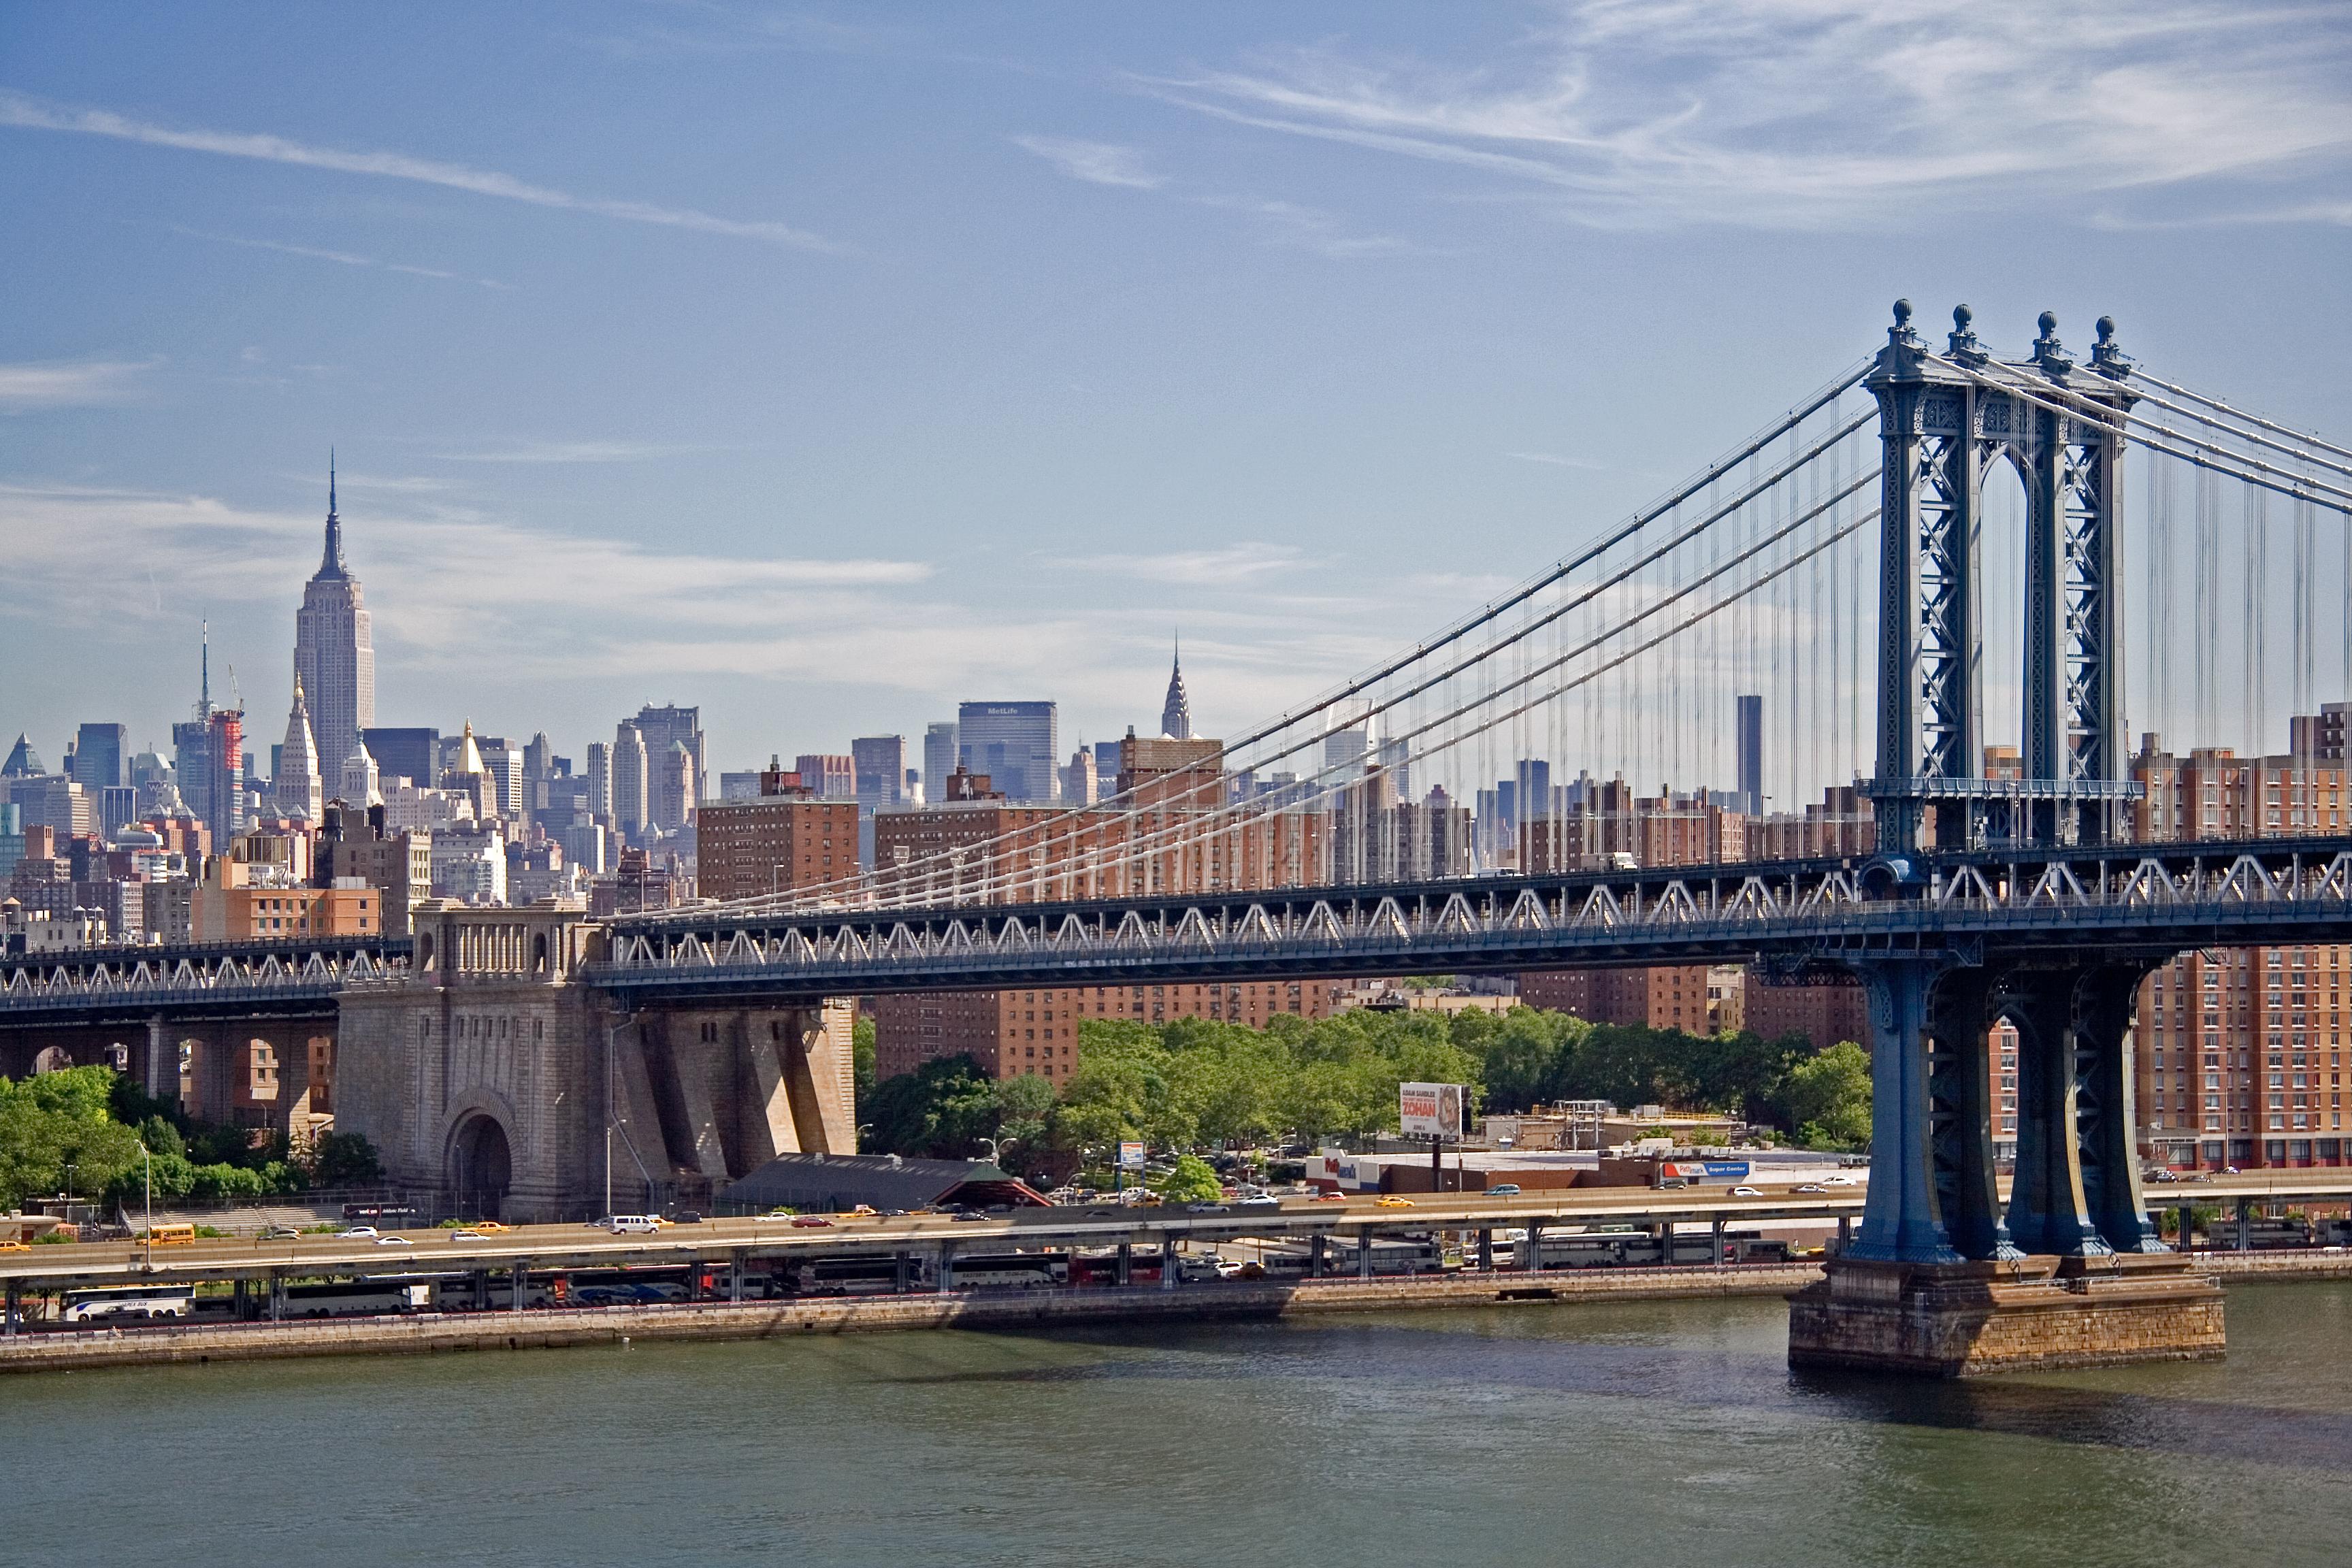 manhattan bridge Manhattan bridge, nyc puzzle in bridges jigsaw puzzles on thejigsawpuzzlescom play full screen, enjoy puzzle of the day and thousands more.